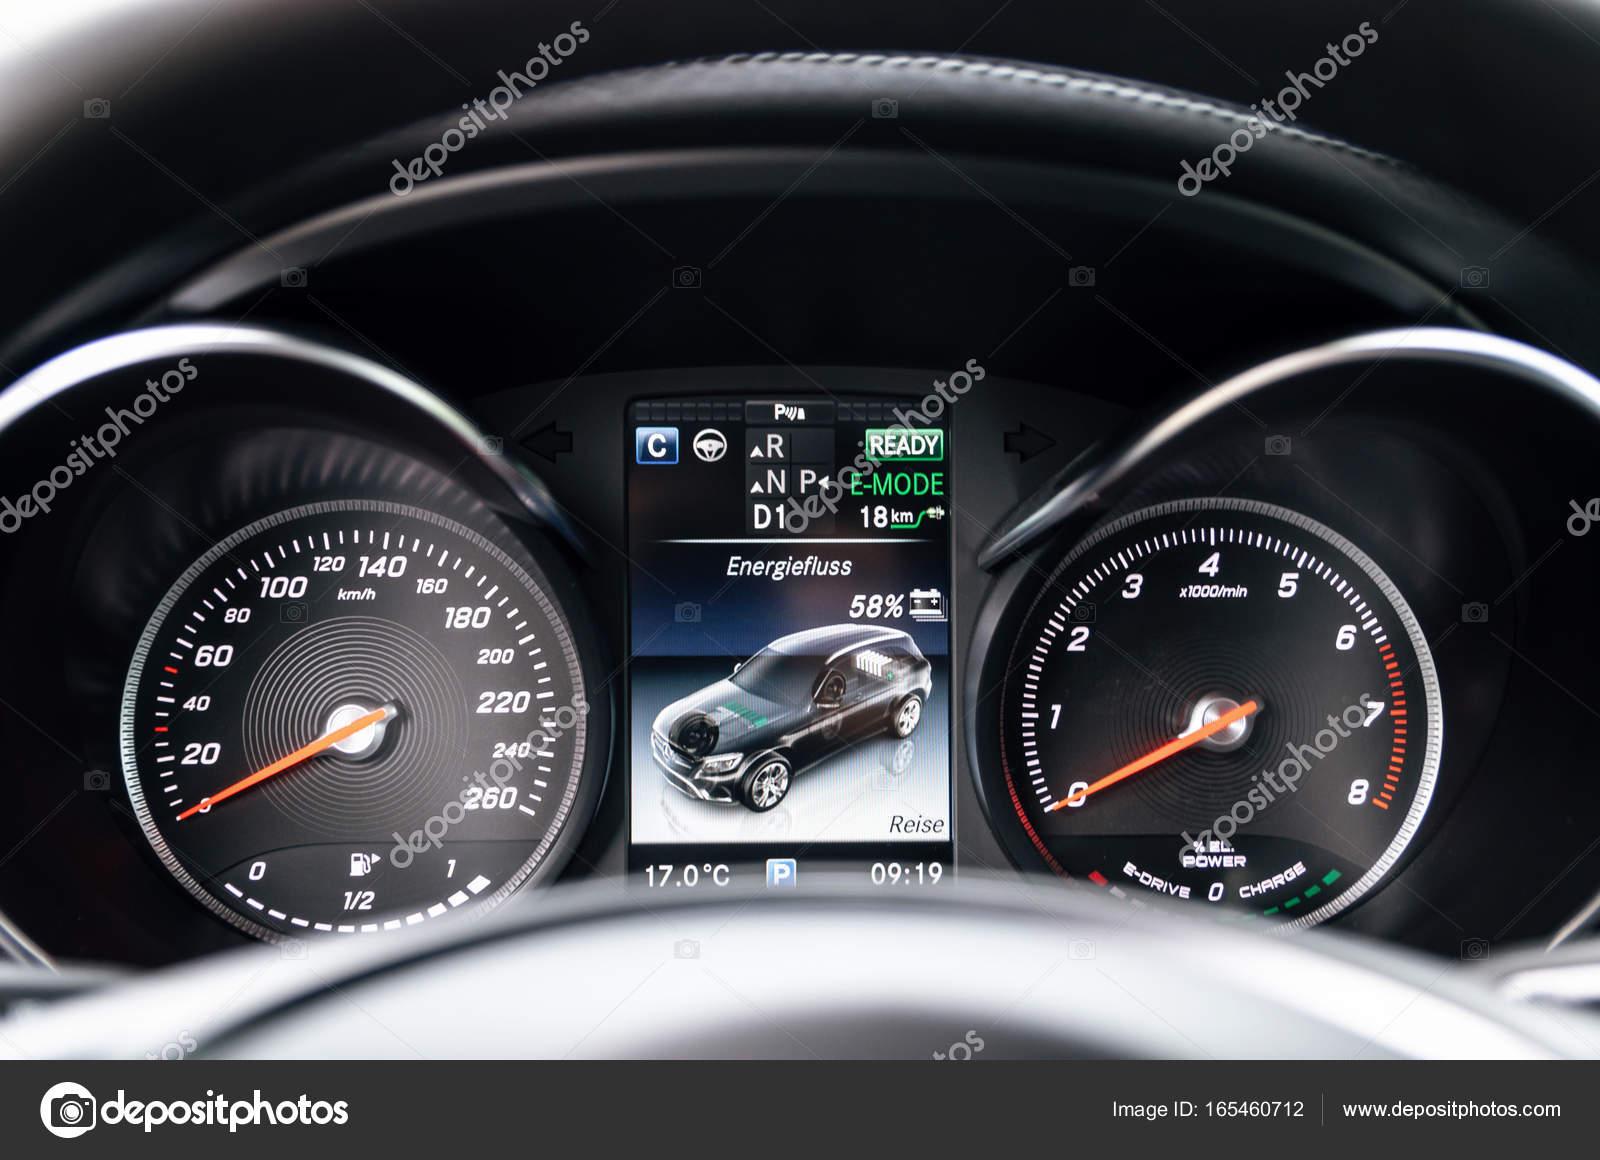 Armaturenbrett mercedes  Armaturenbrett des Mercedes-Benz Glc 350 e-Plug-in Hybrid ...